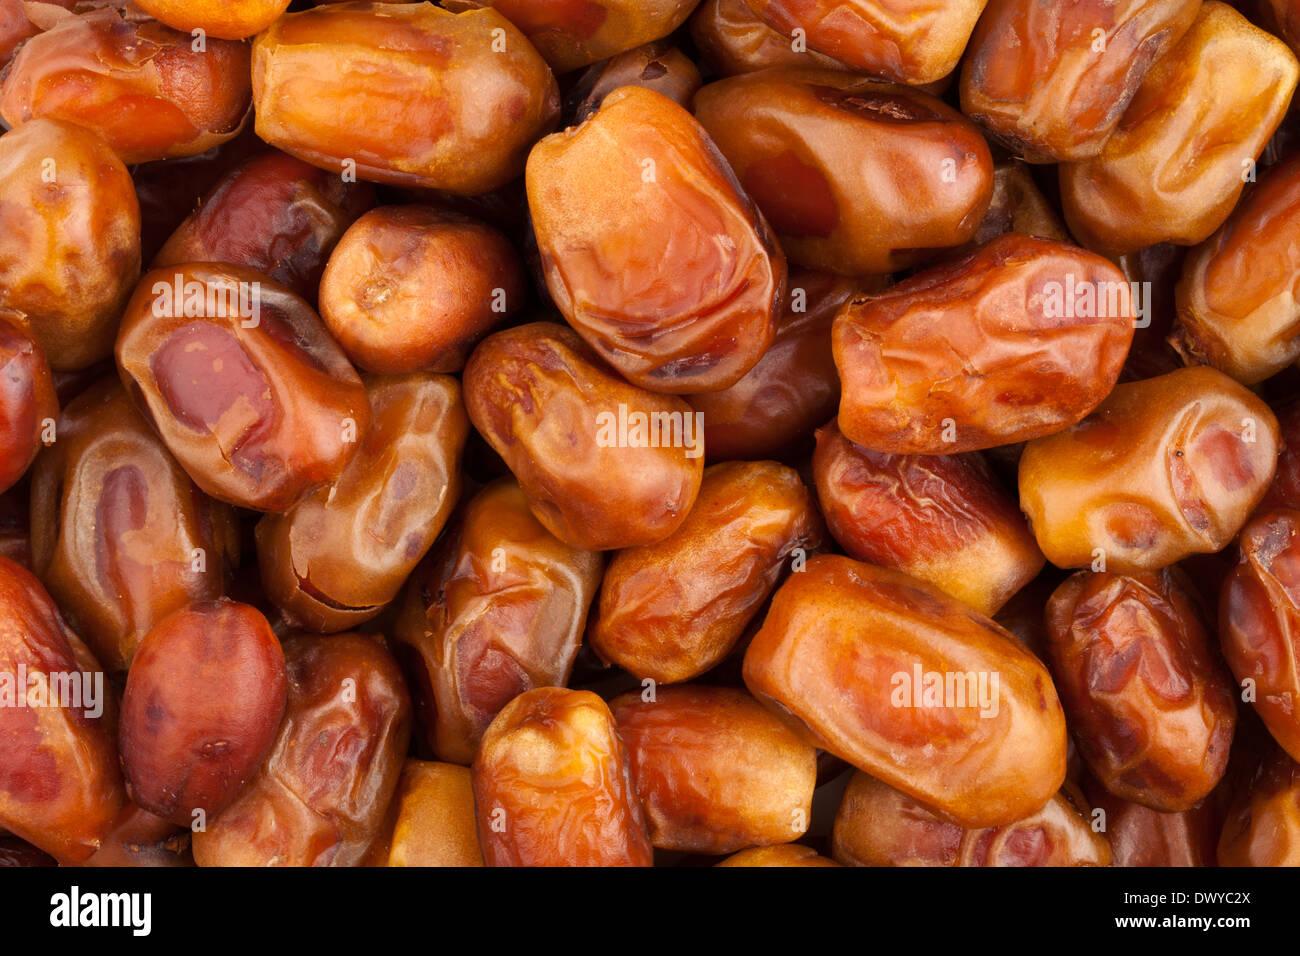 Termine-Obst-Hintergrund Stockbild